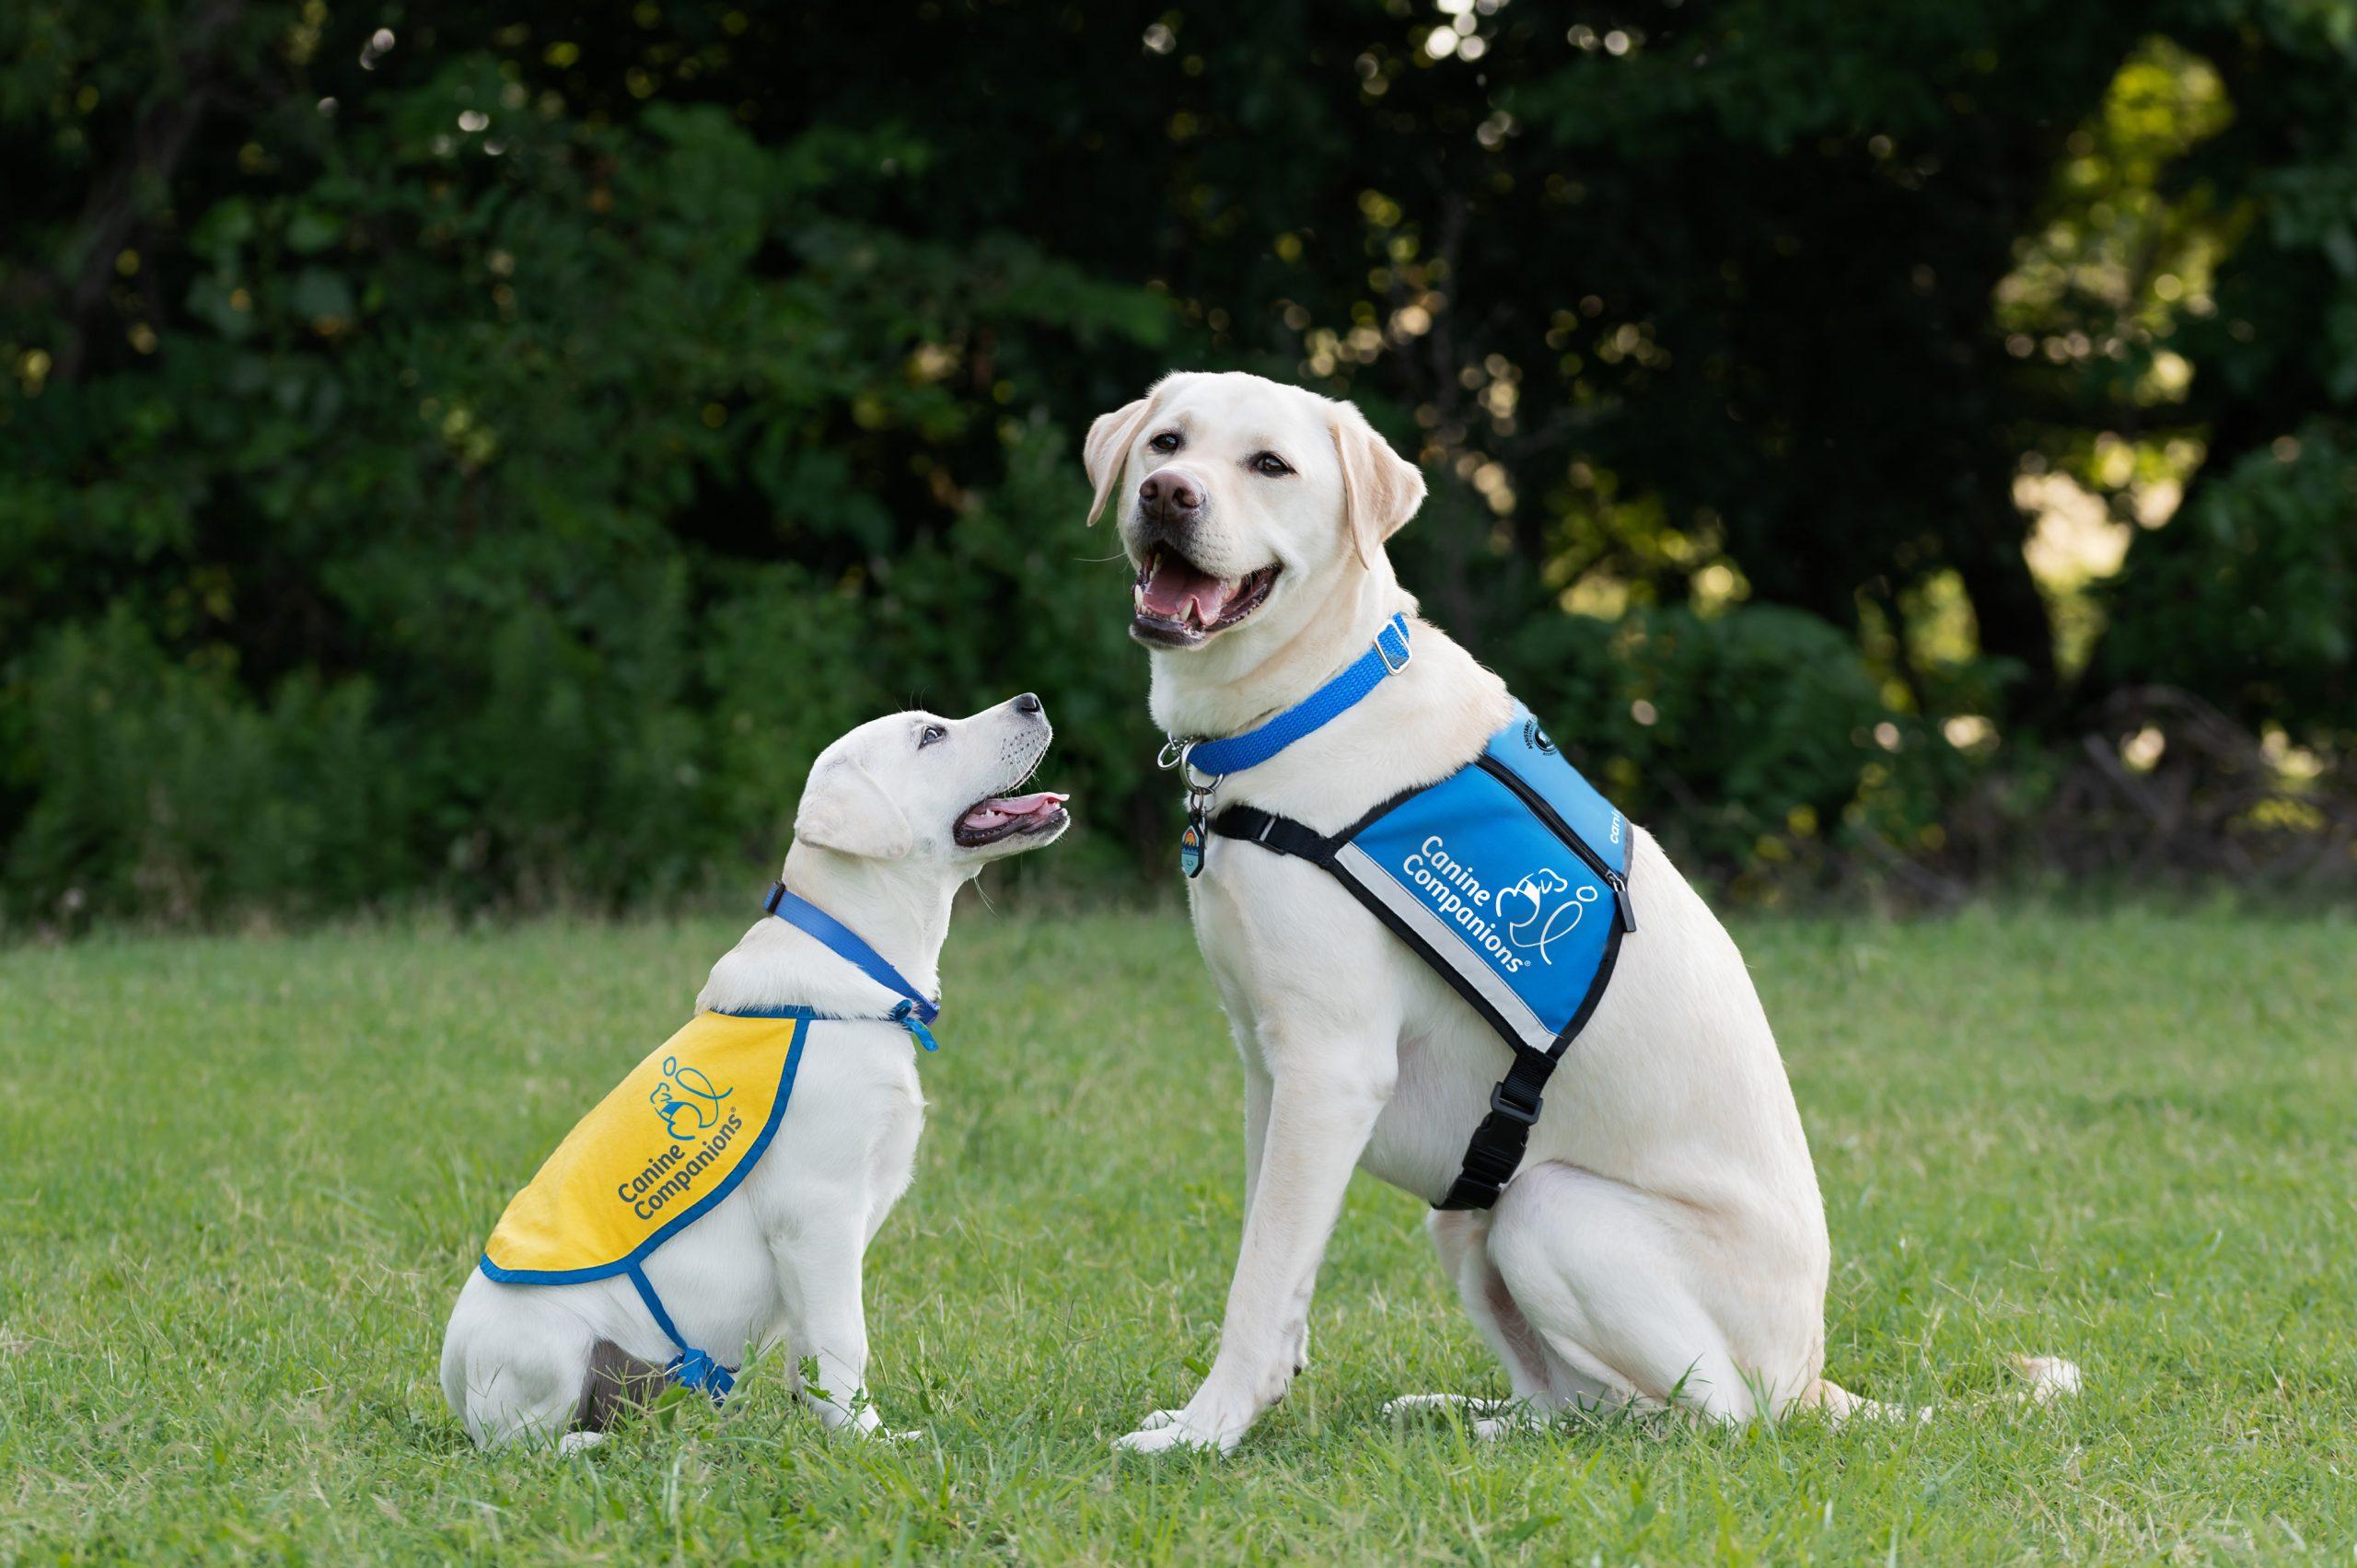 DSC_1110-Riley-VI-and-Hearing-Dog-Fallon-Angela-Mahana-RGB_promo4